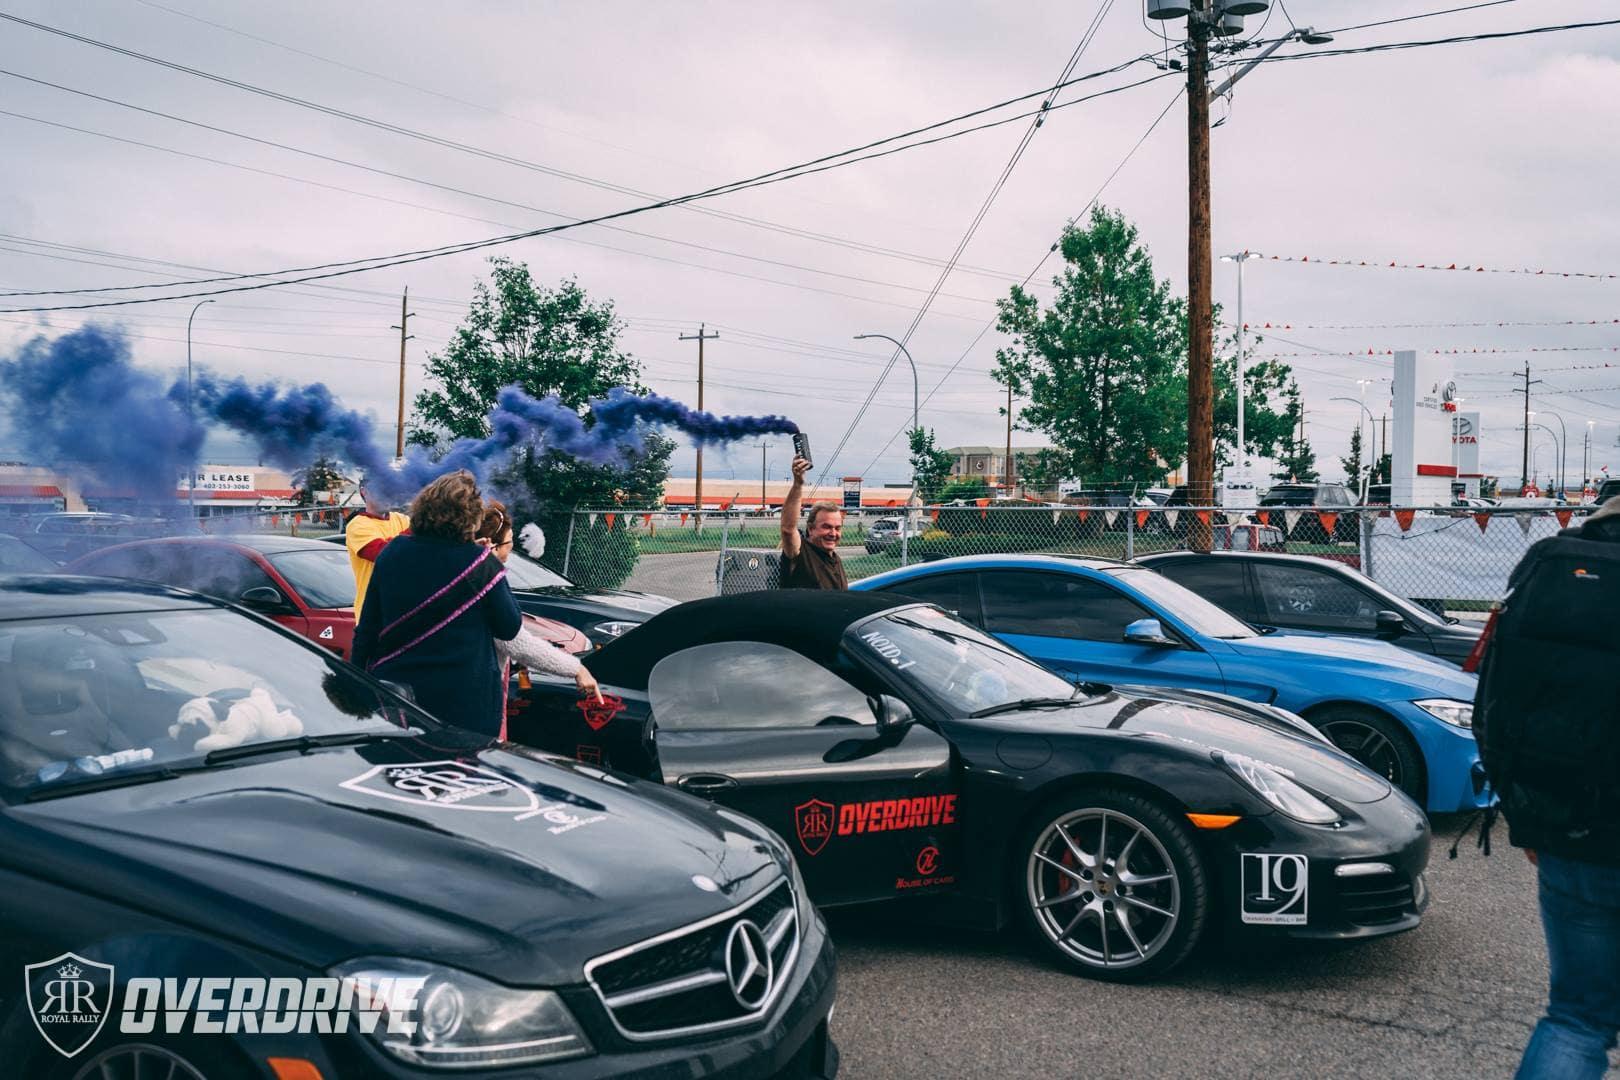 House of Cars Calgary Sponsors the Royal Rally